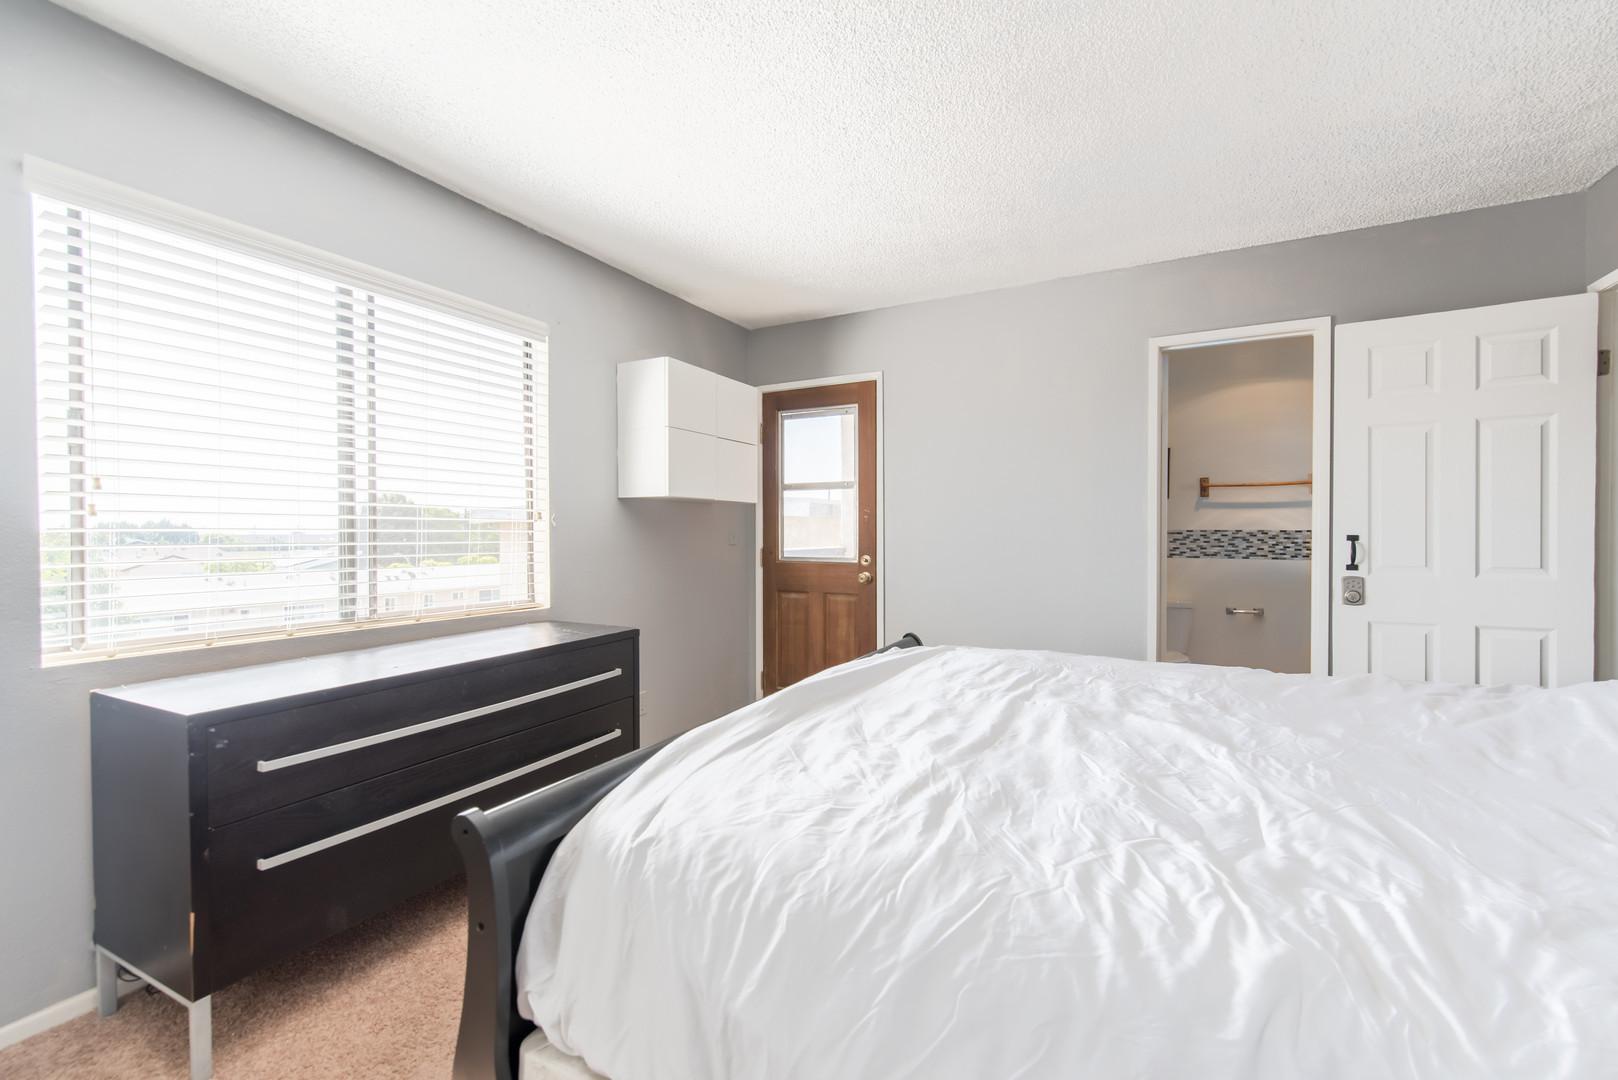 11 Bedroom 1-1.jpg